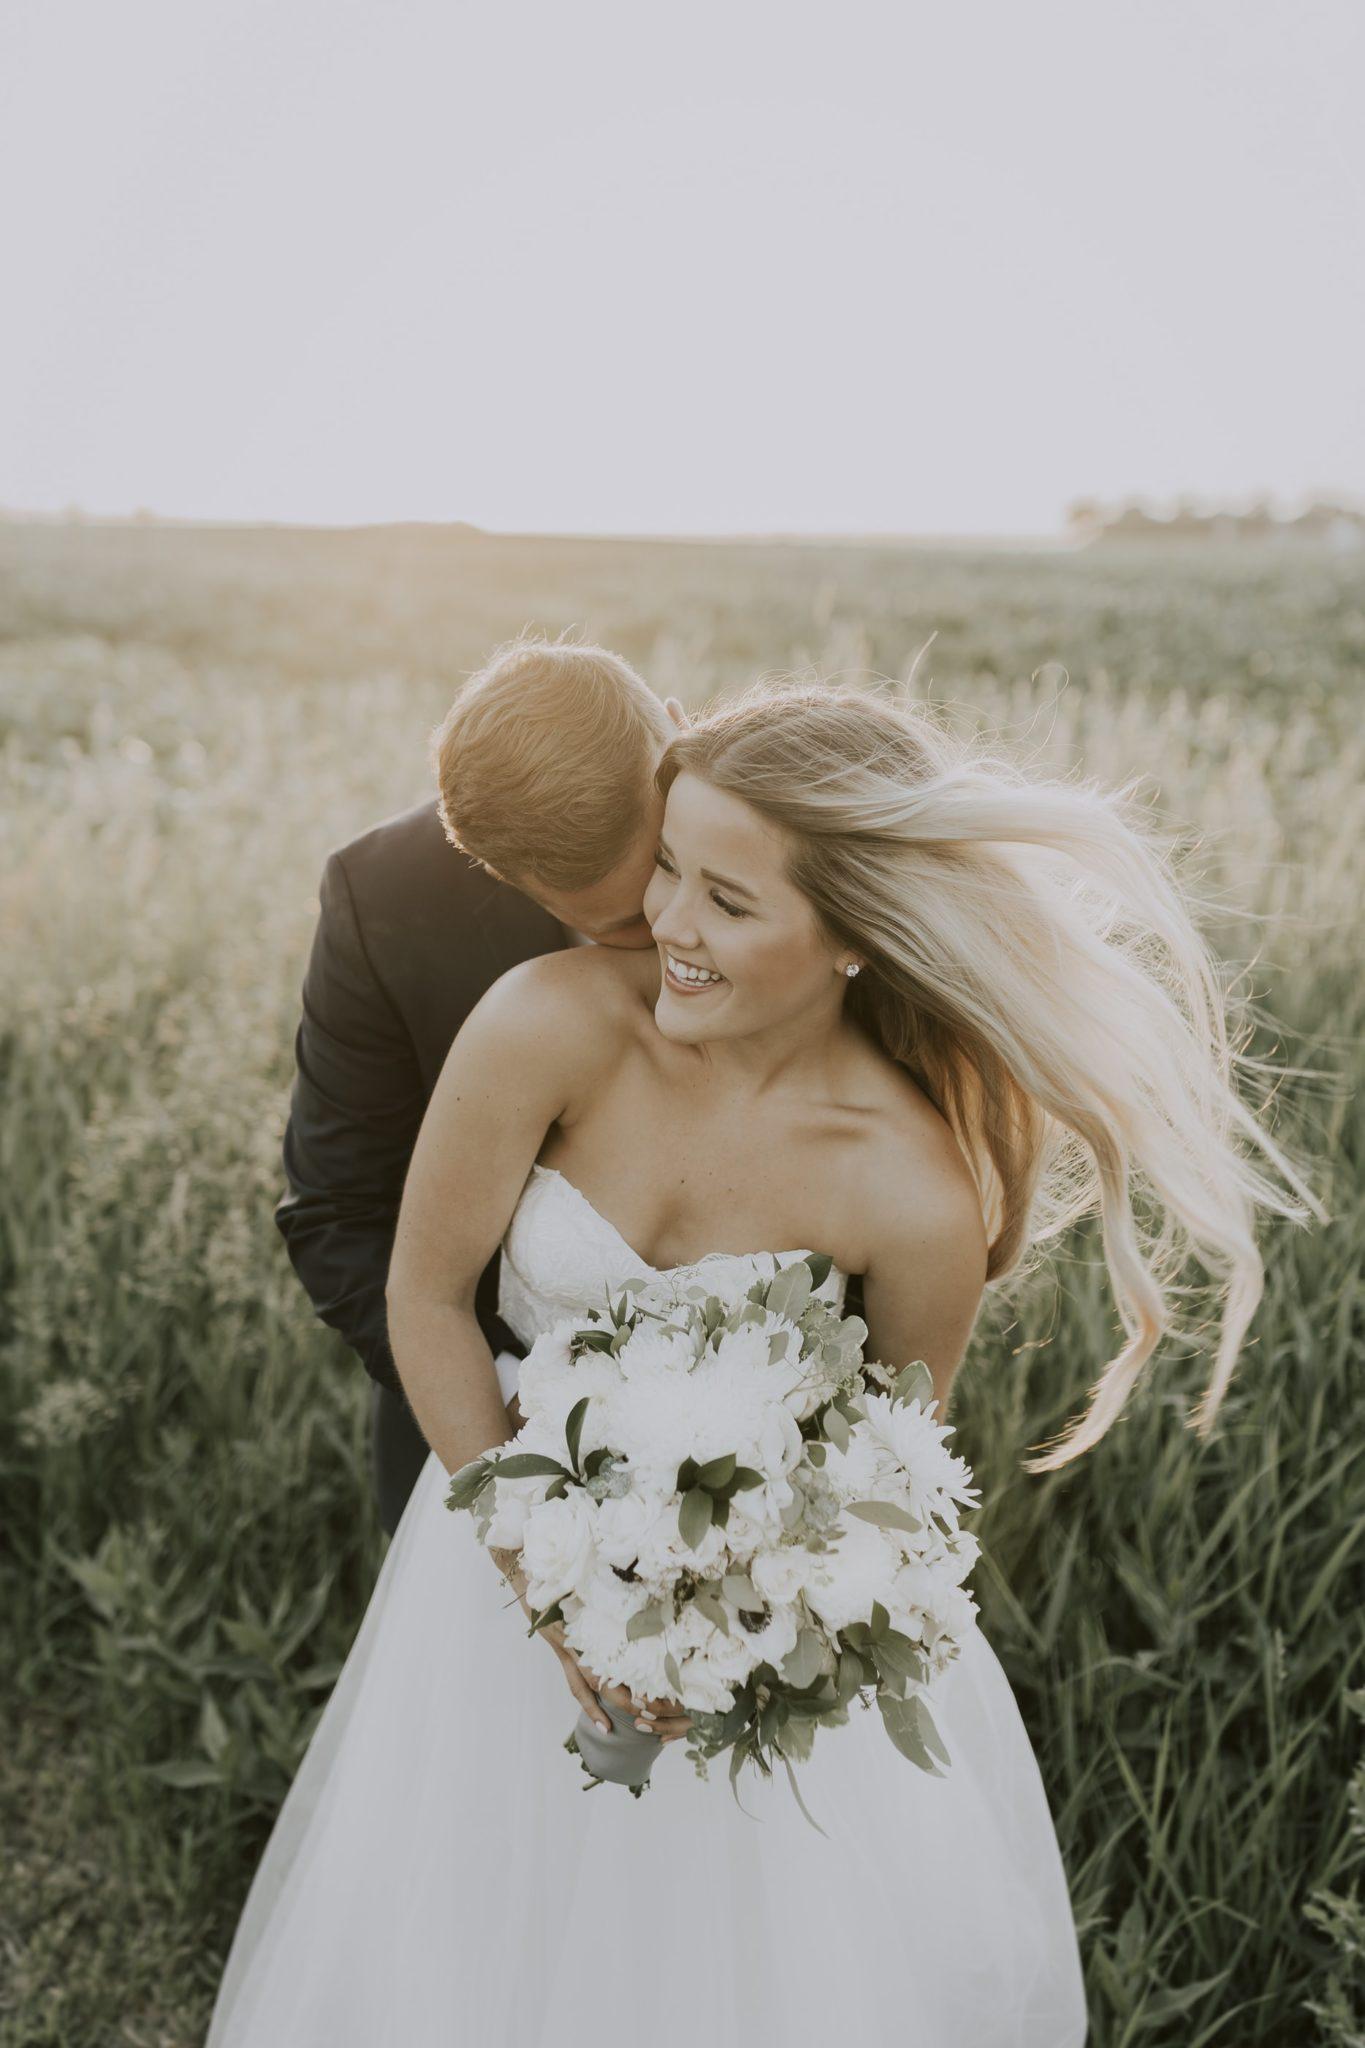 Cand nu se fac nunti in 2020 – Calendar Crestin Ortodox si zile legale